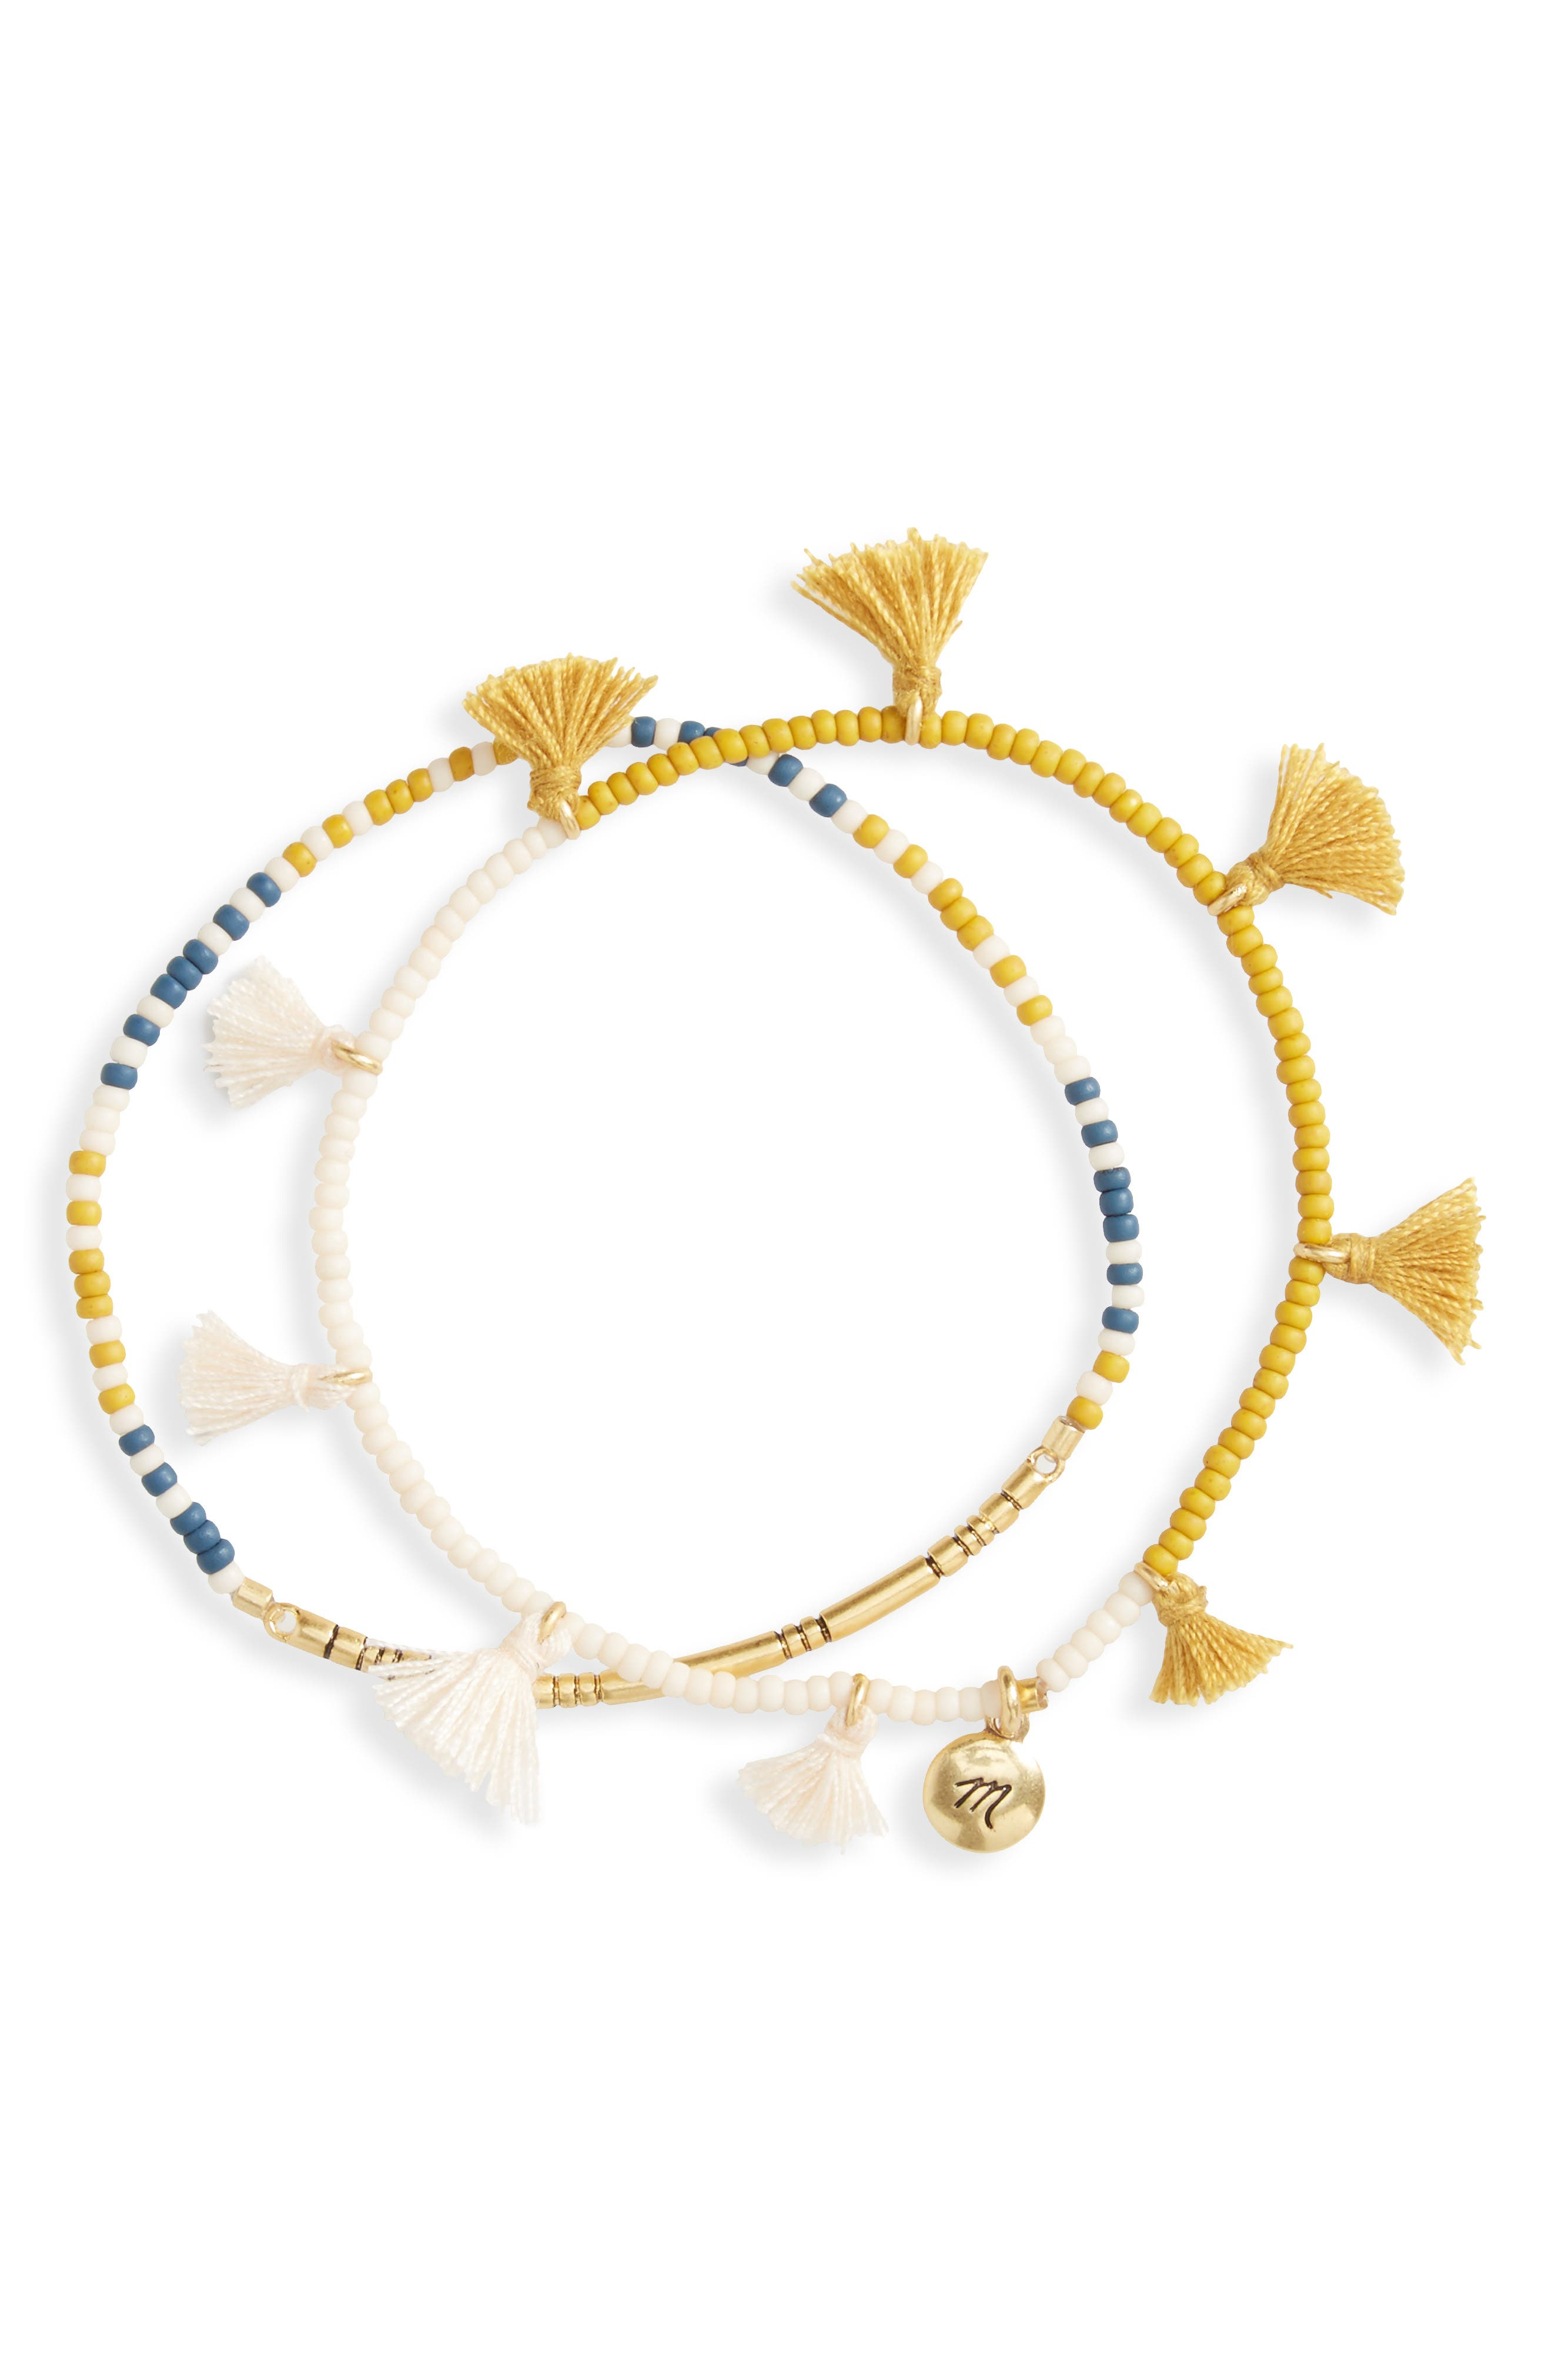 Alternate Image 1 Selected - Madewell Set of 2 Tassel Stretch Bracelets